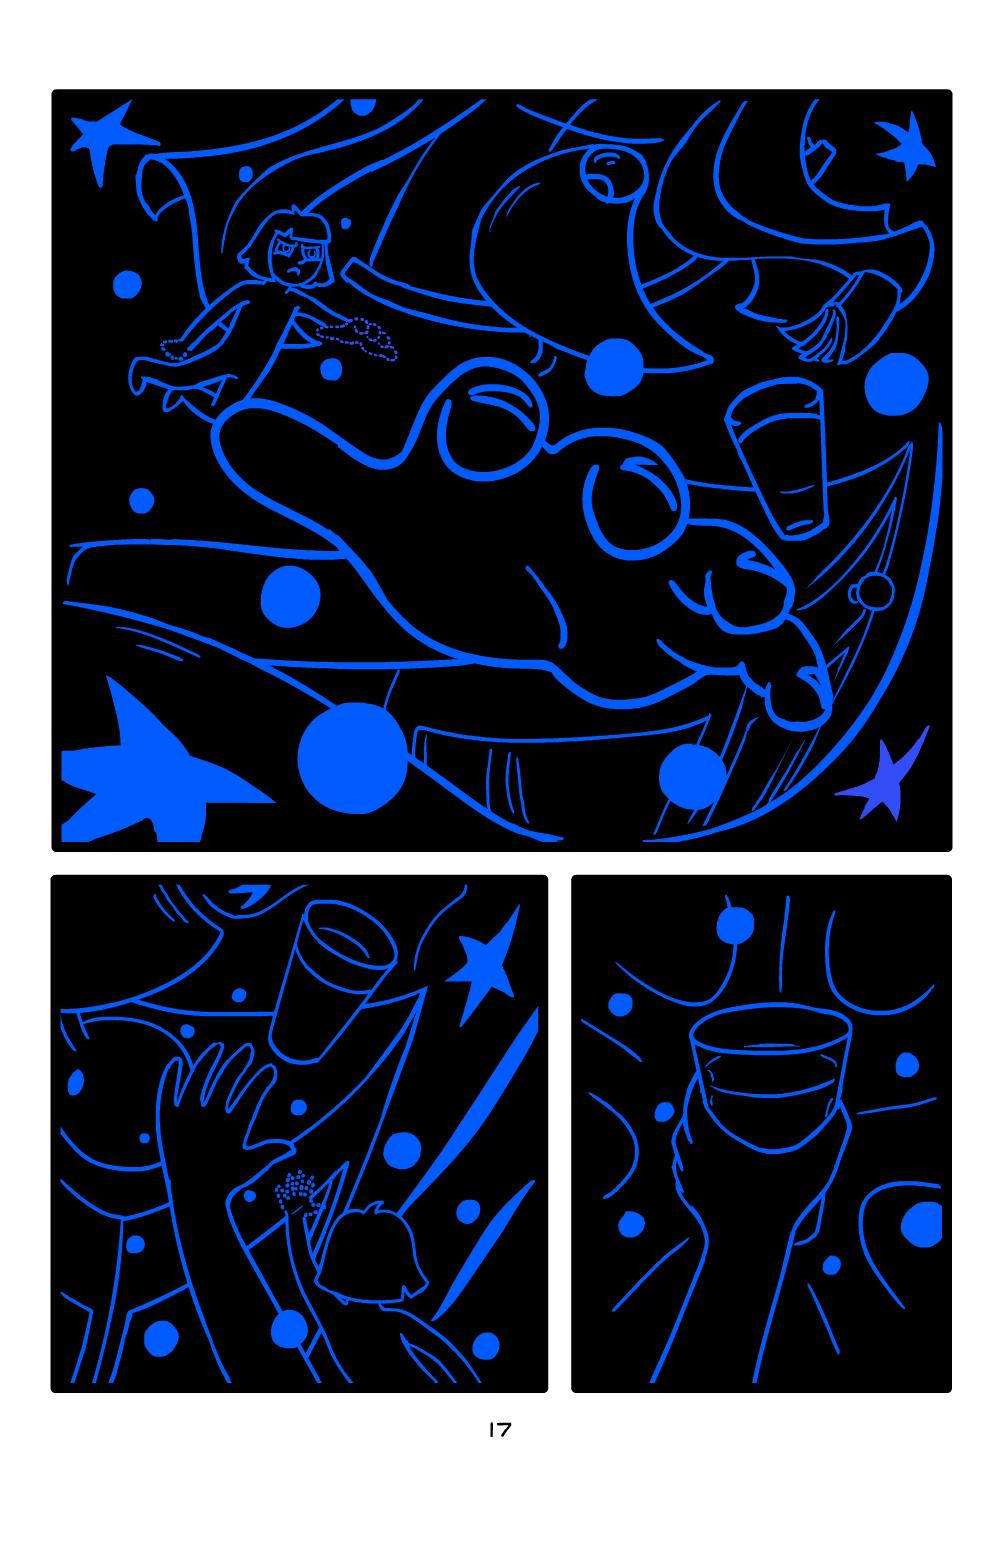 The-Body-Sleeps-9-15-17.jpg